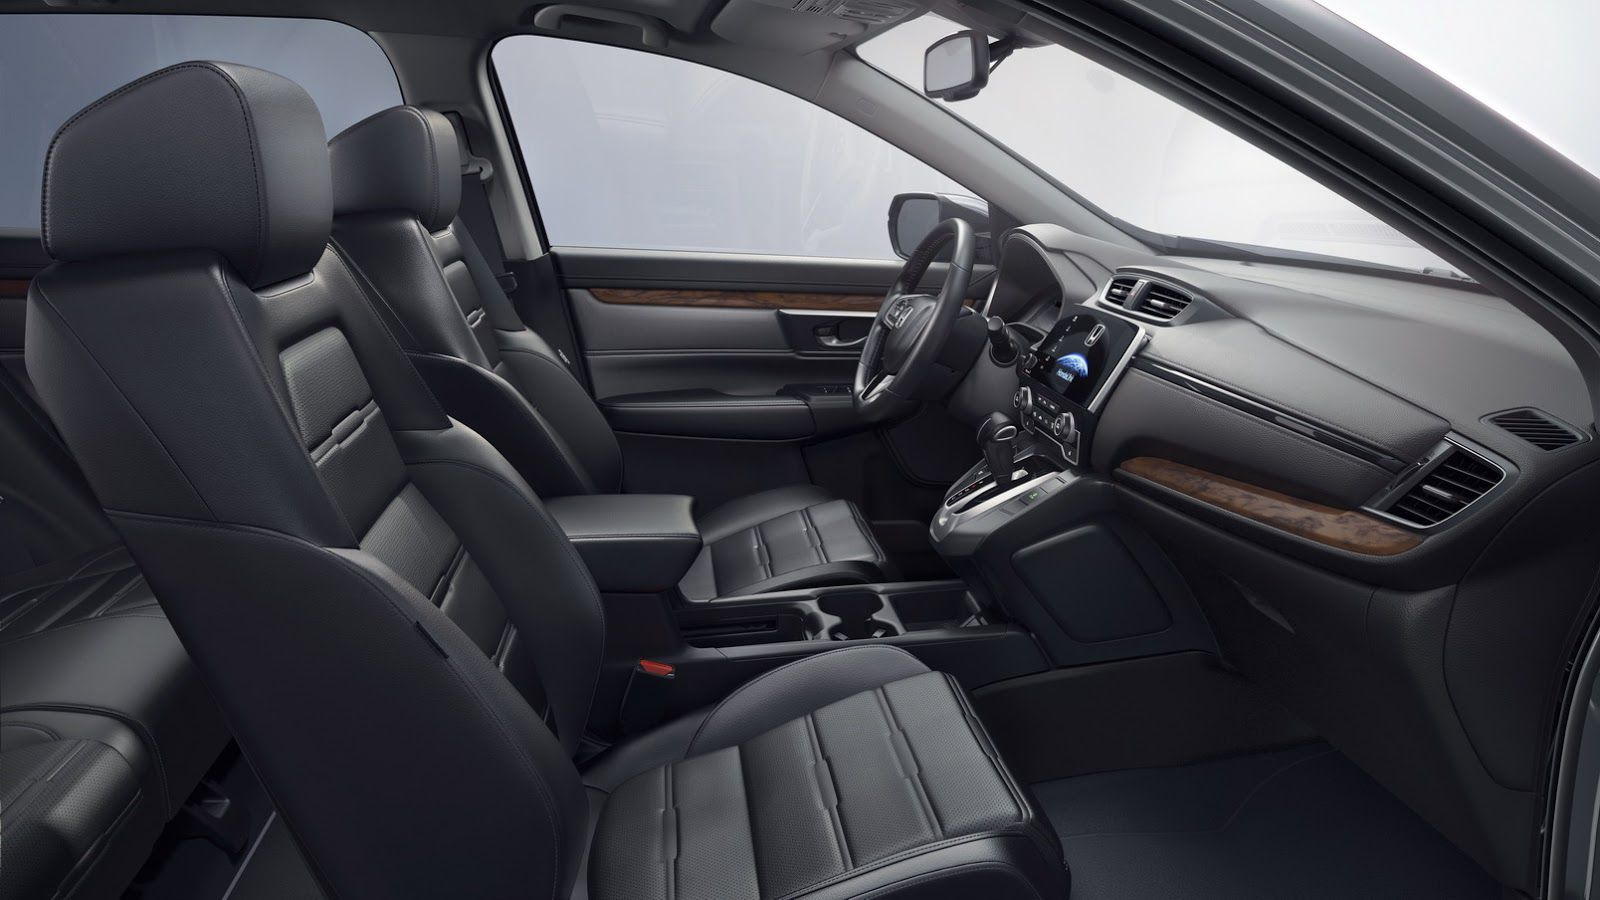 Novo Honda CRV 2017